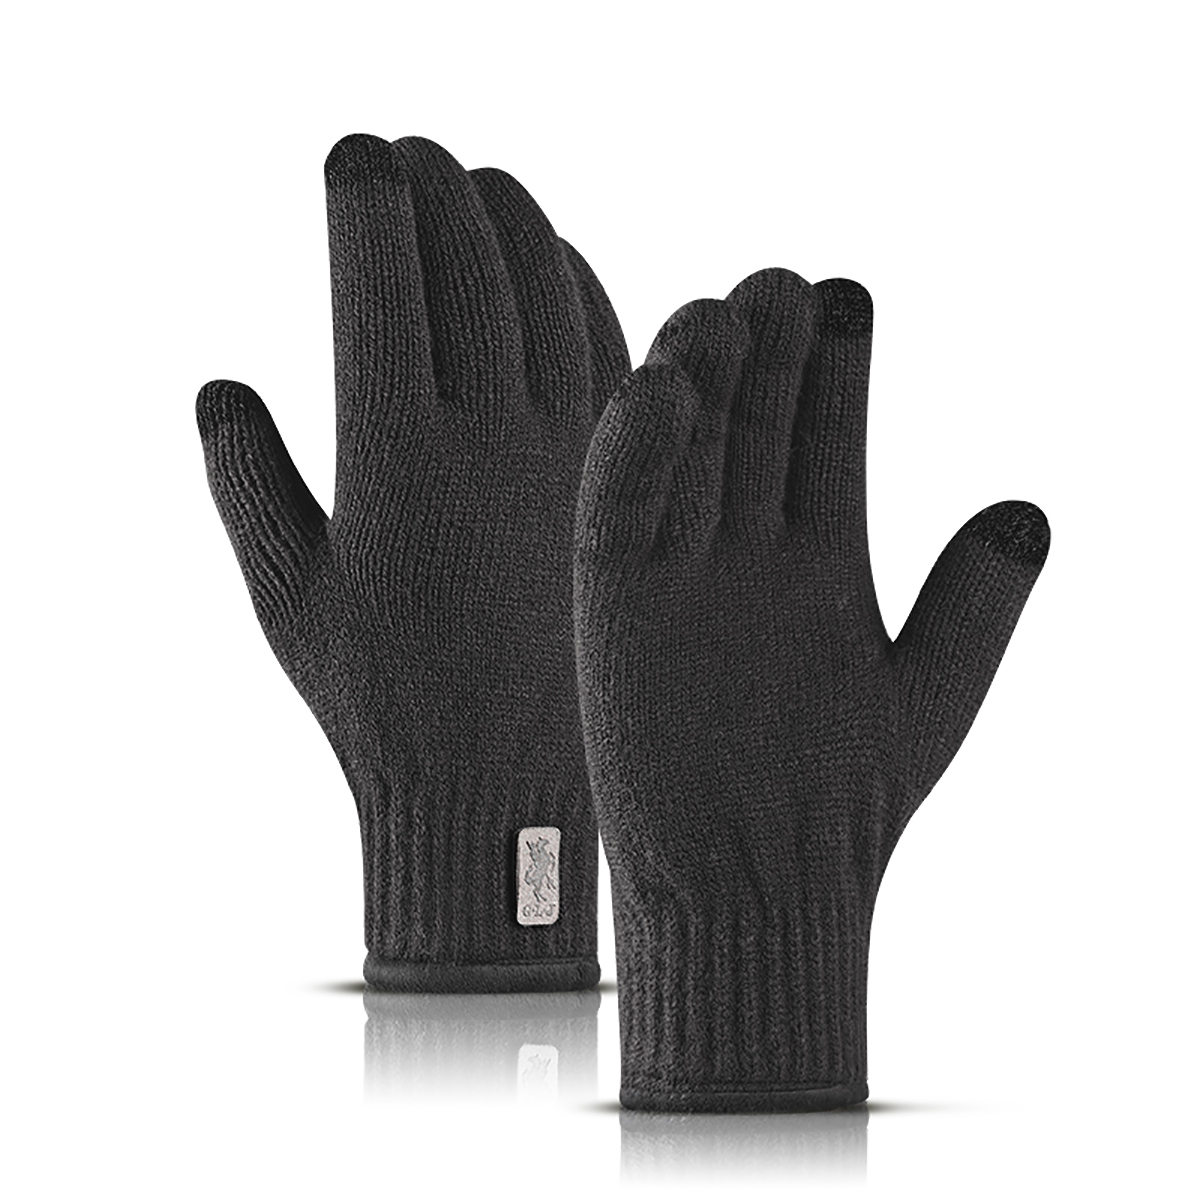 Touch Screen Gloves Winter Warm Windproof Waterproof Fleece Lined Thermal Mountaineering Ski Mens